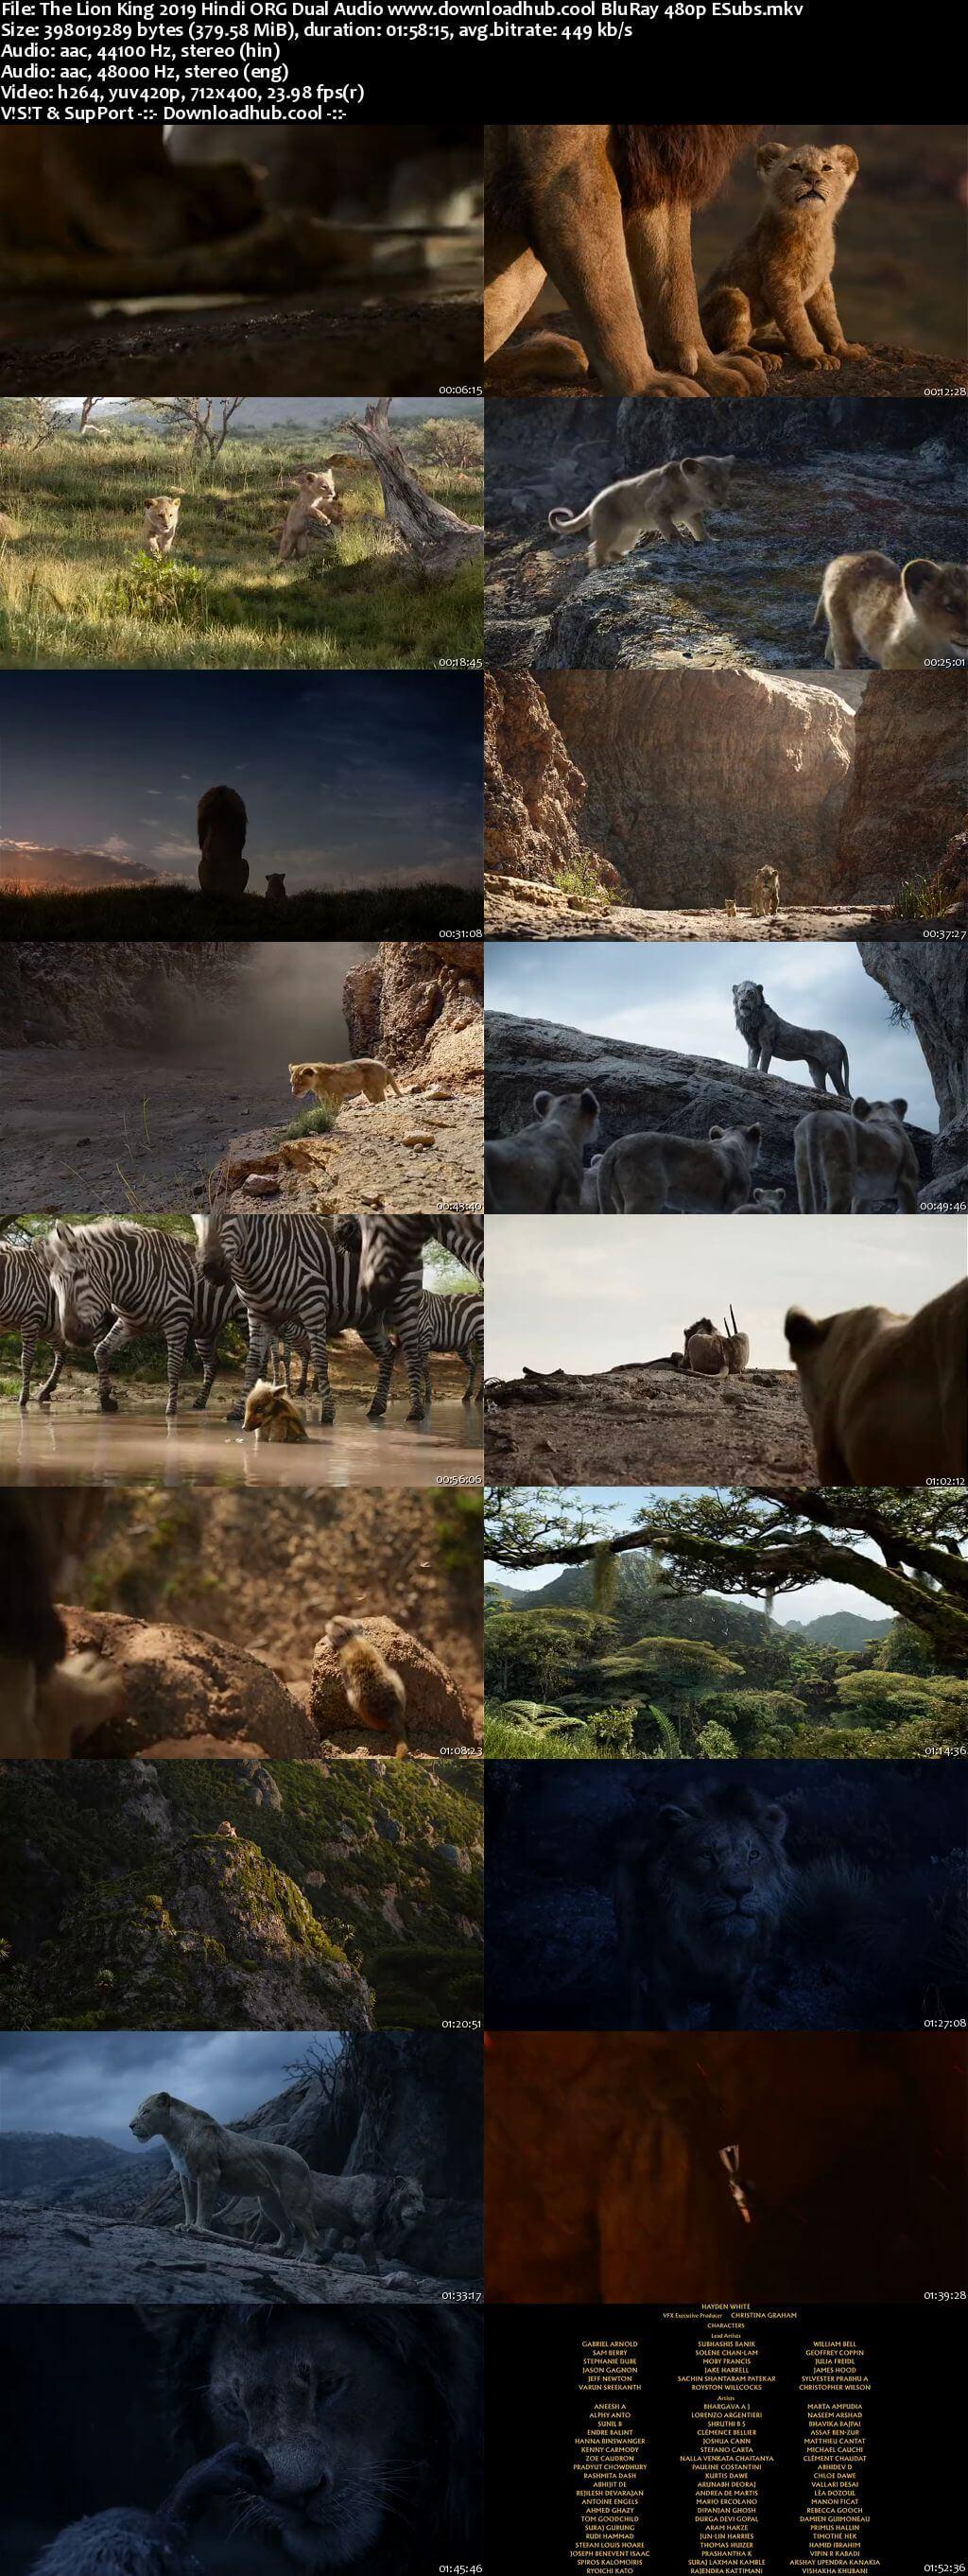 The Lion King 2019 Hindi ORG Dual Audio 350MB BluRay 480p ESubs